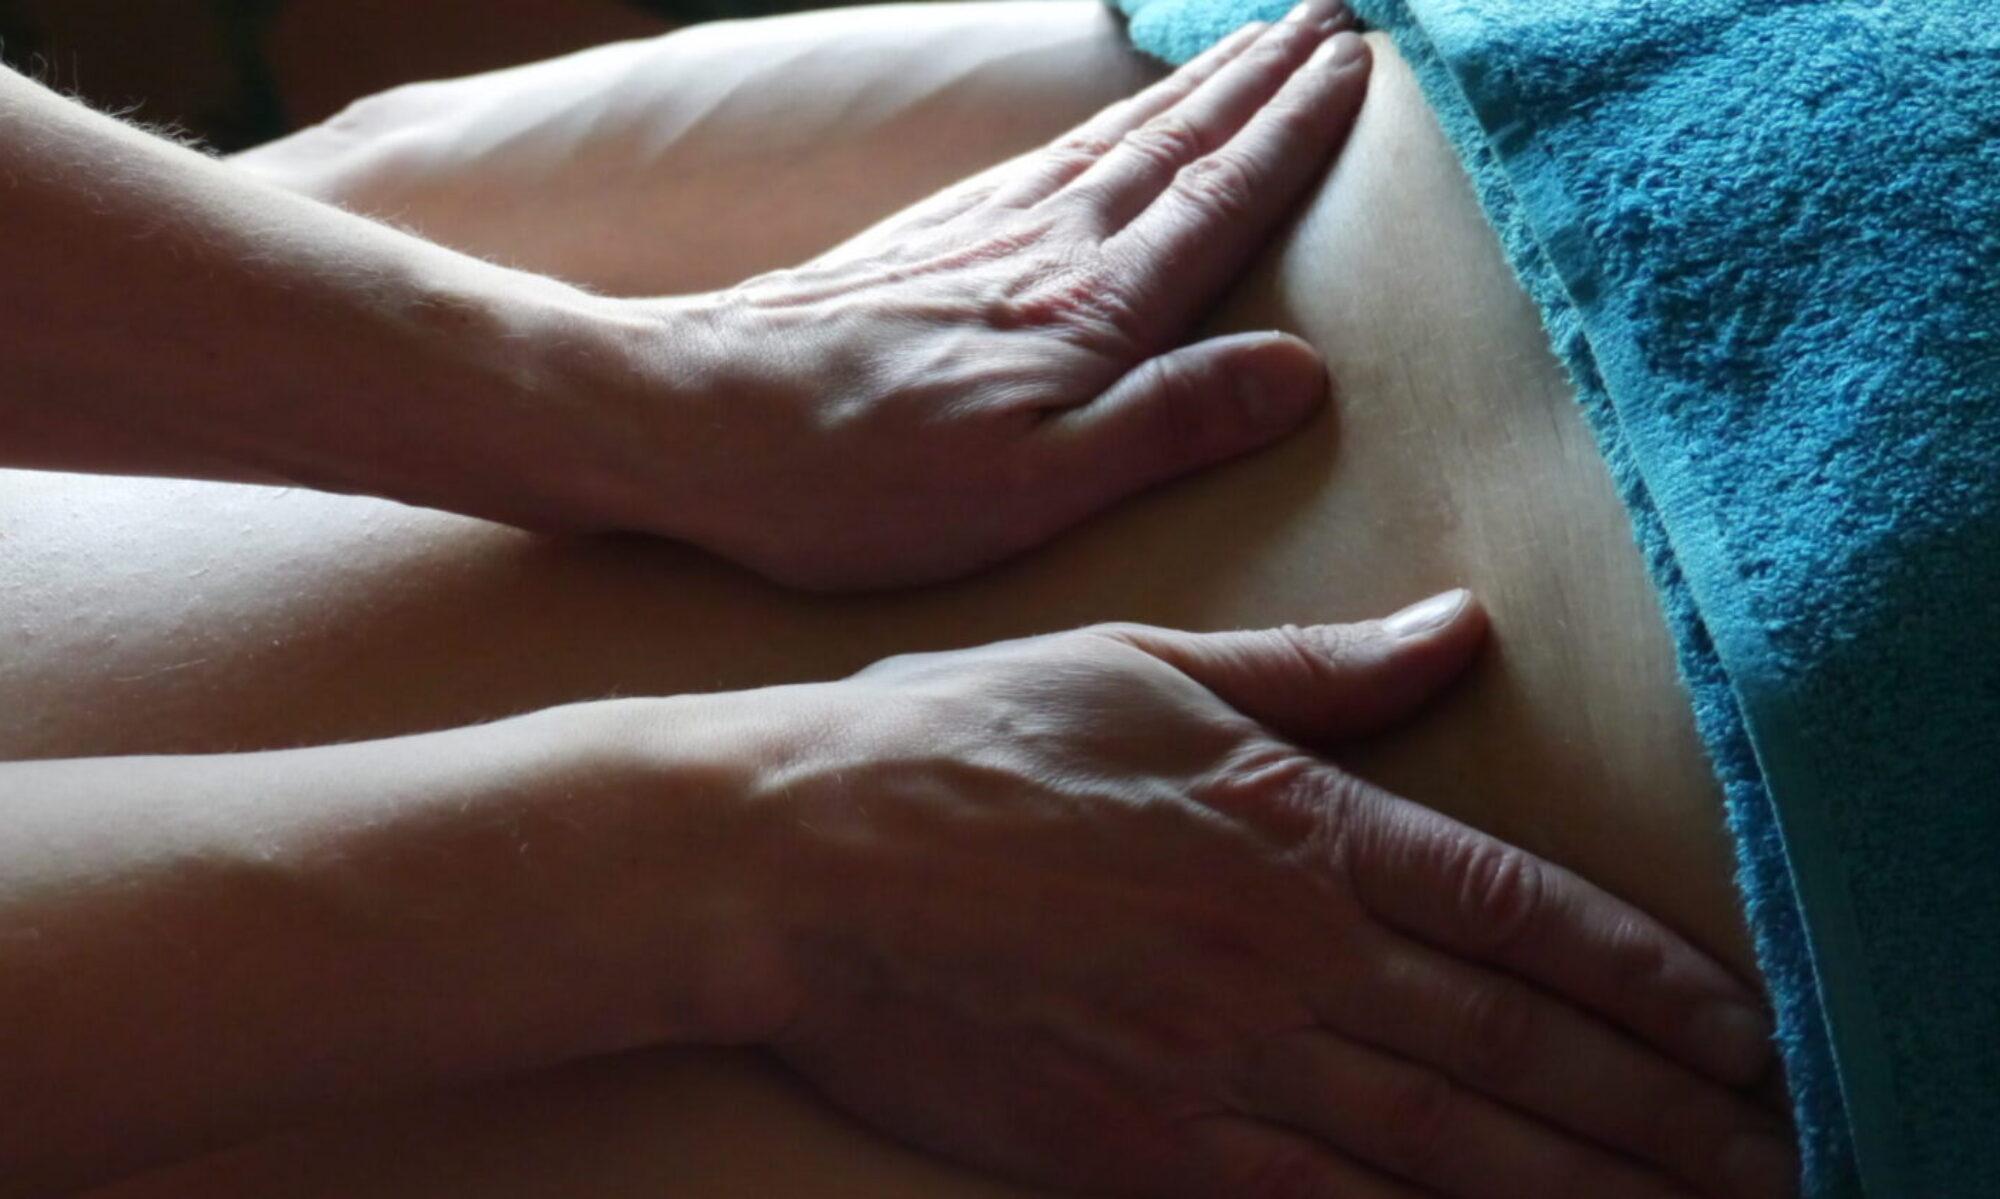 Lagom Massage Therapy